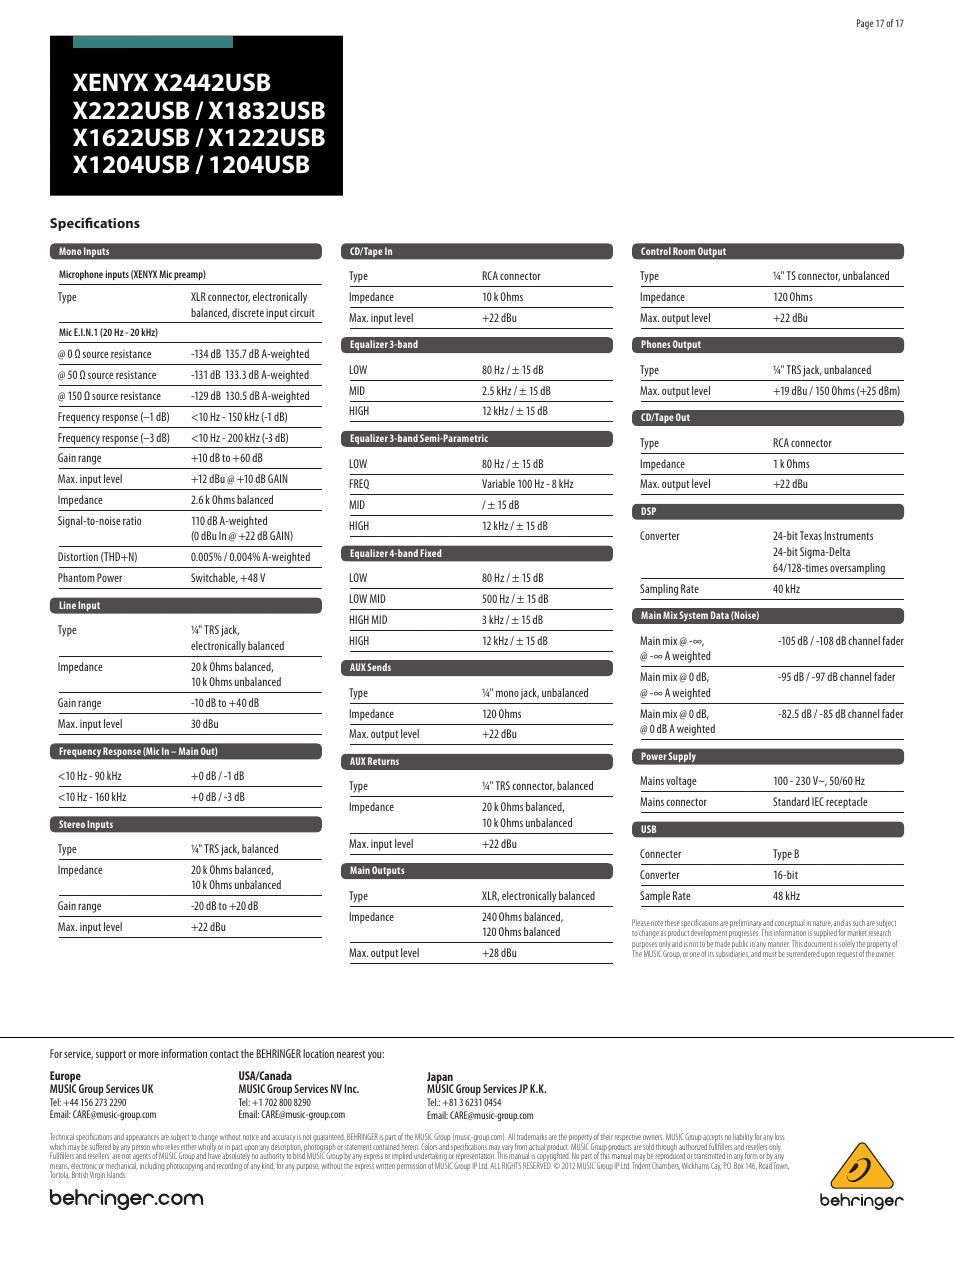 Behringer Xenyx 1204usb User Manual